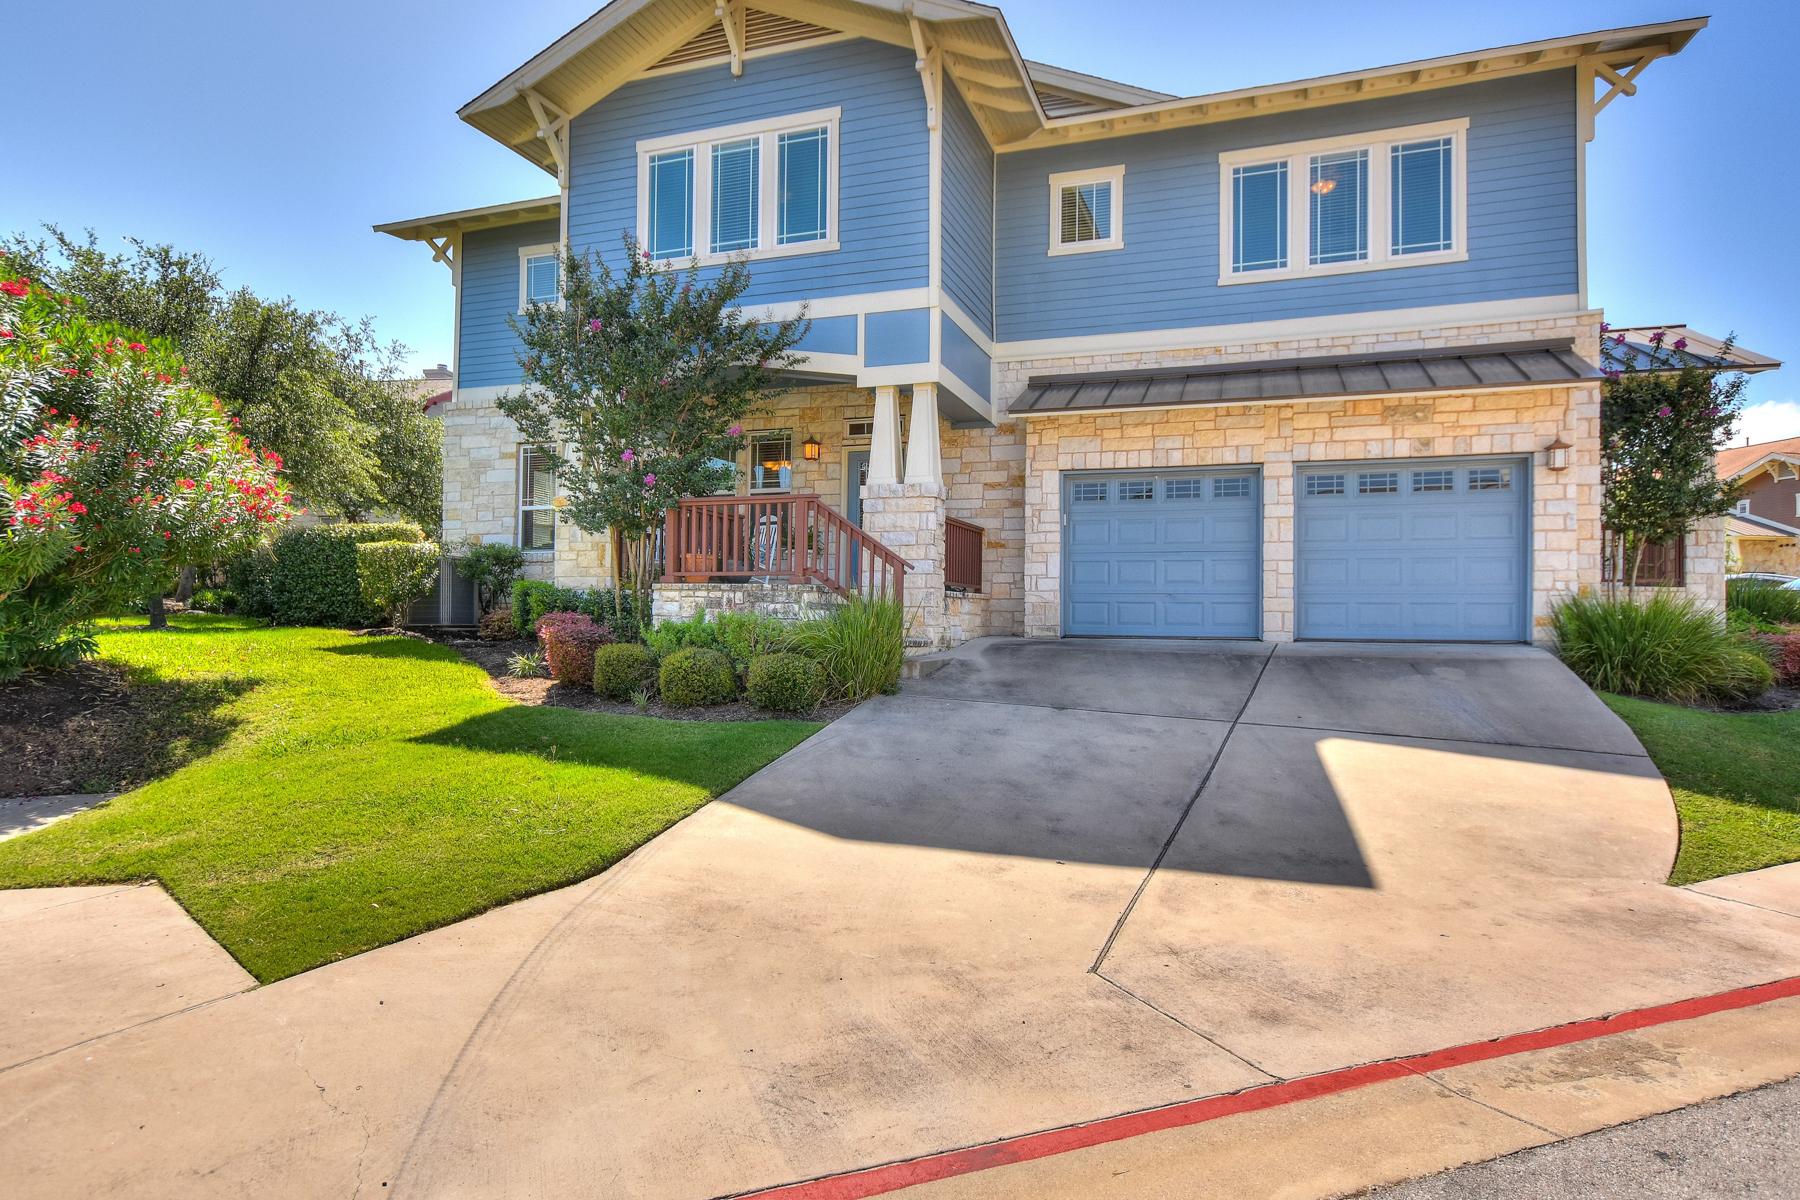 Condominium for Sale at Luxury Condo in Twin Creeks 2930 Grand Oaks Loop 1603 Cedar Park, Texas 78613 United States